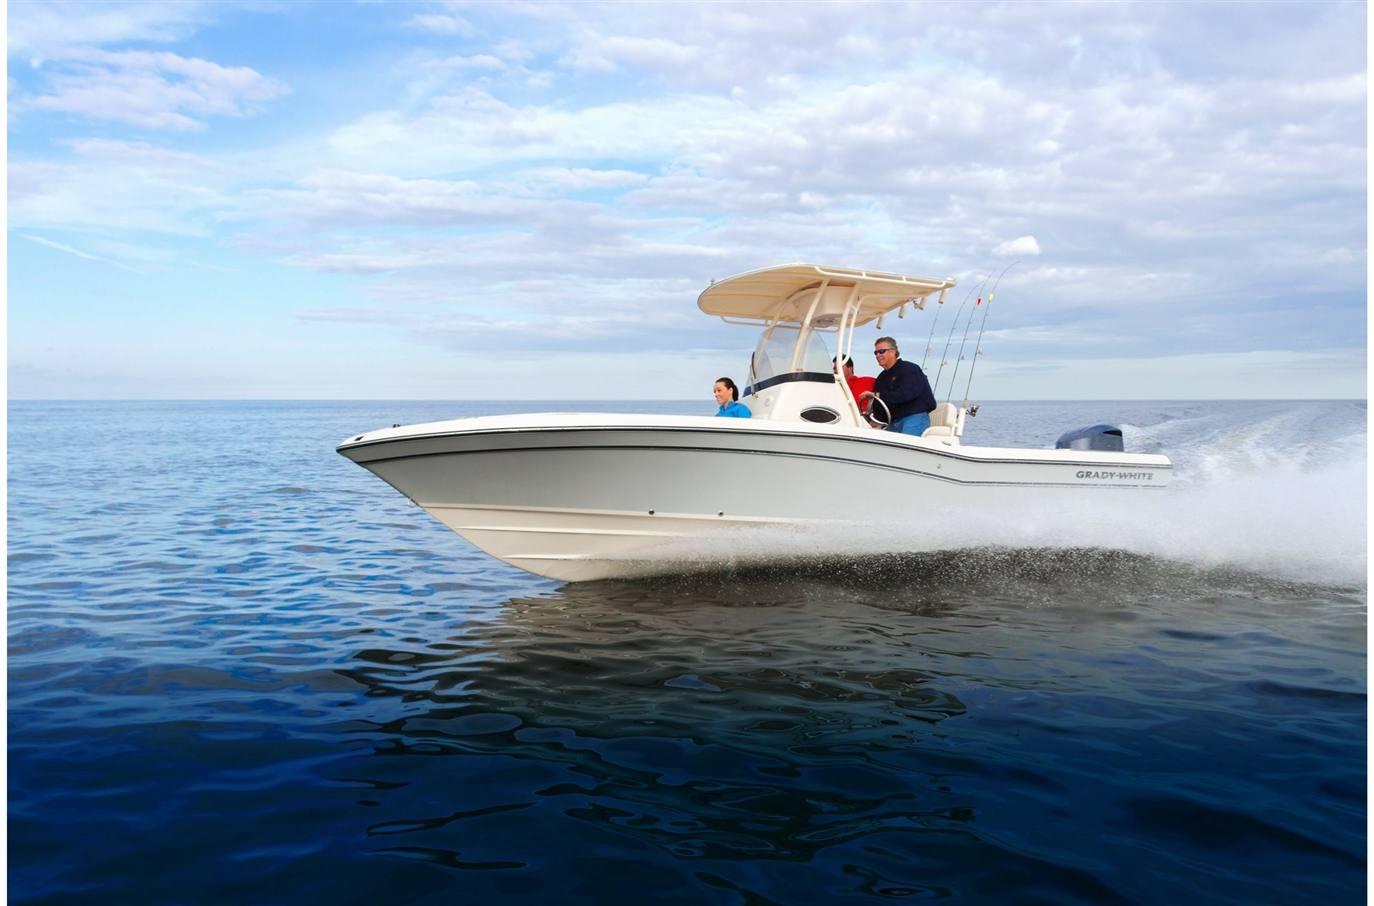 2018 Grady-White 251 CE for sale in Naples, FL  Naples Boat